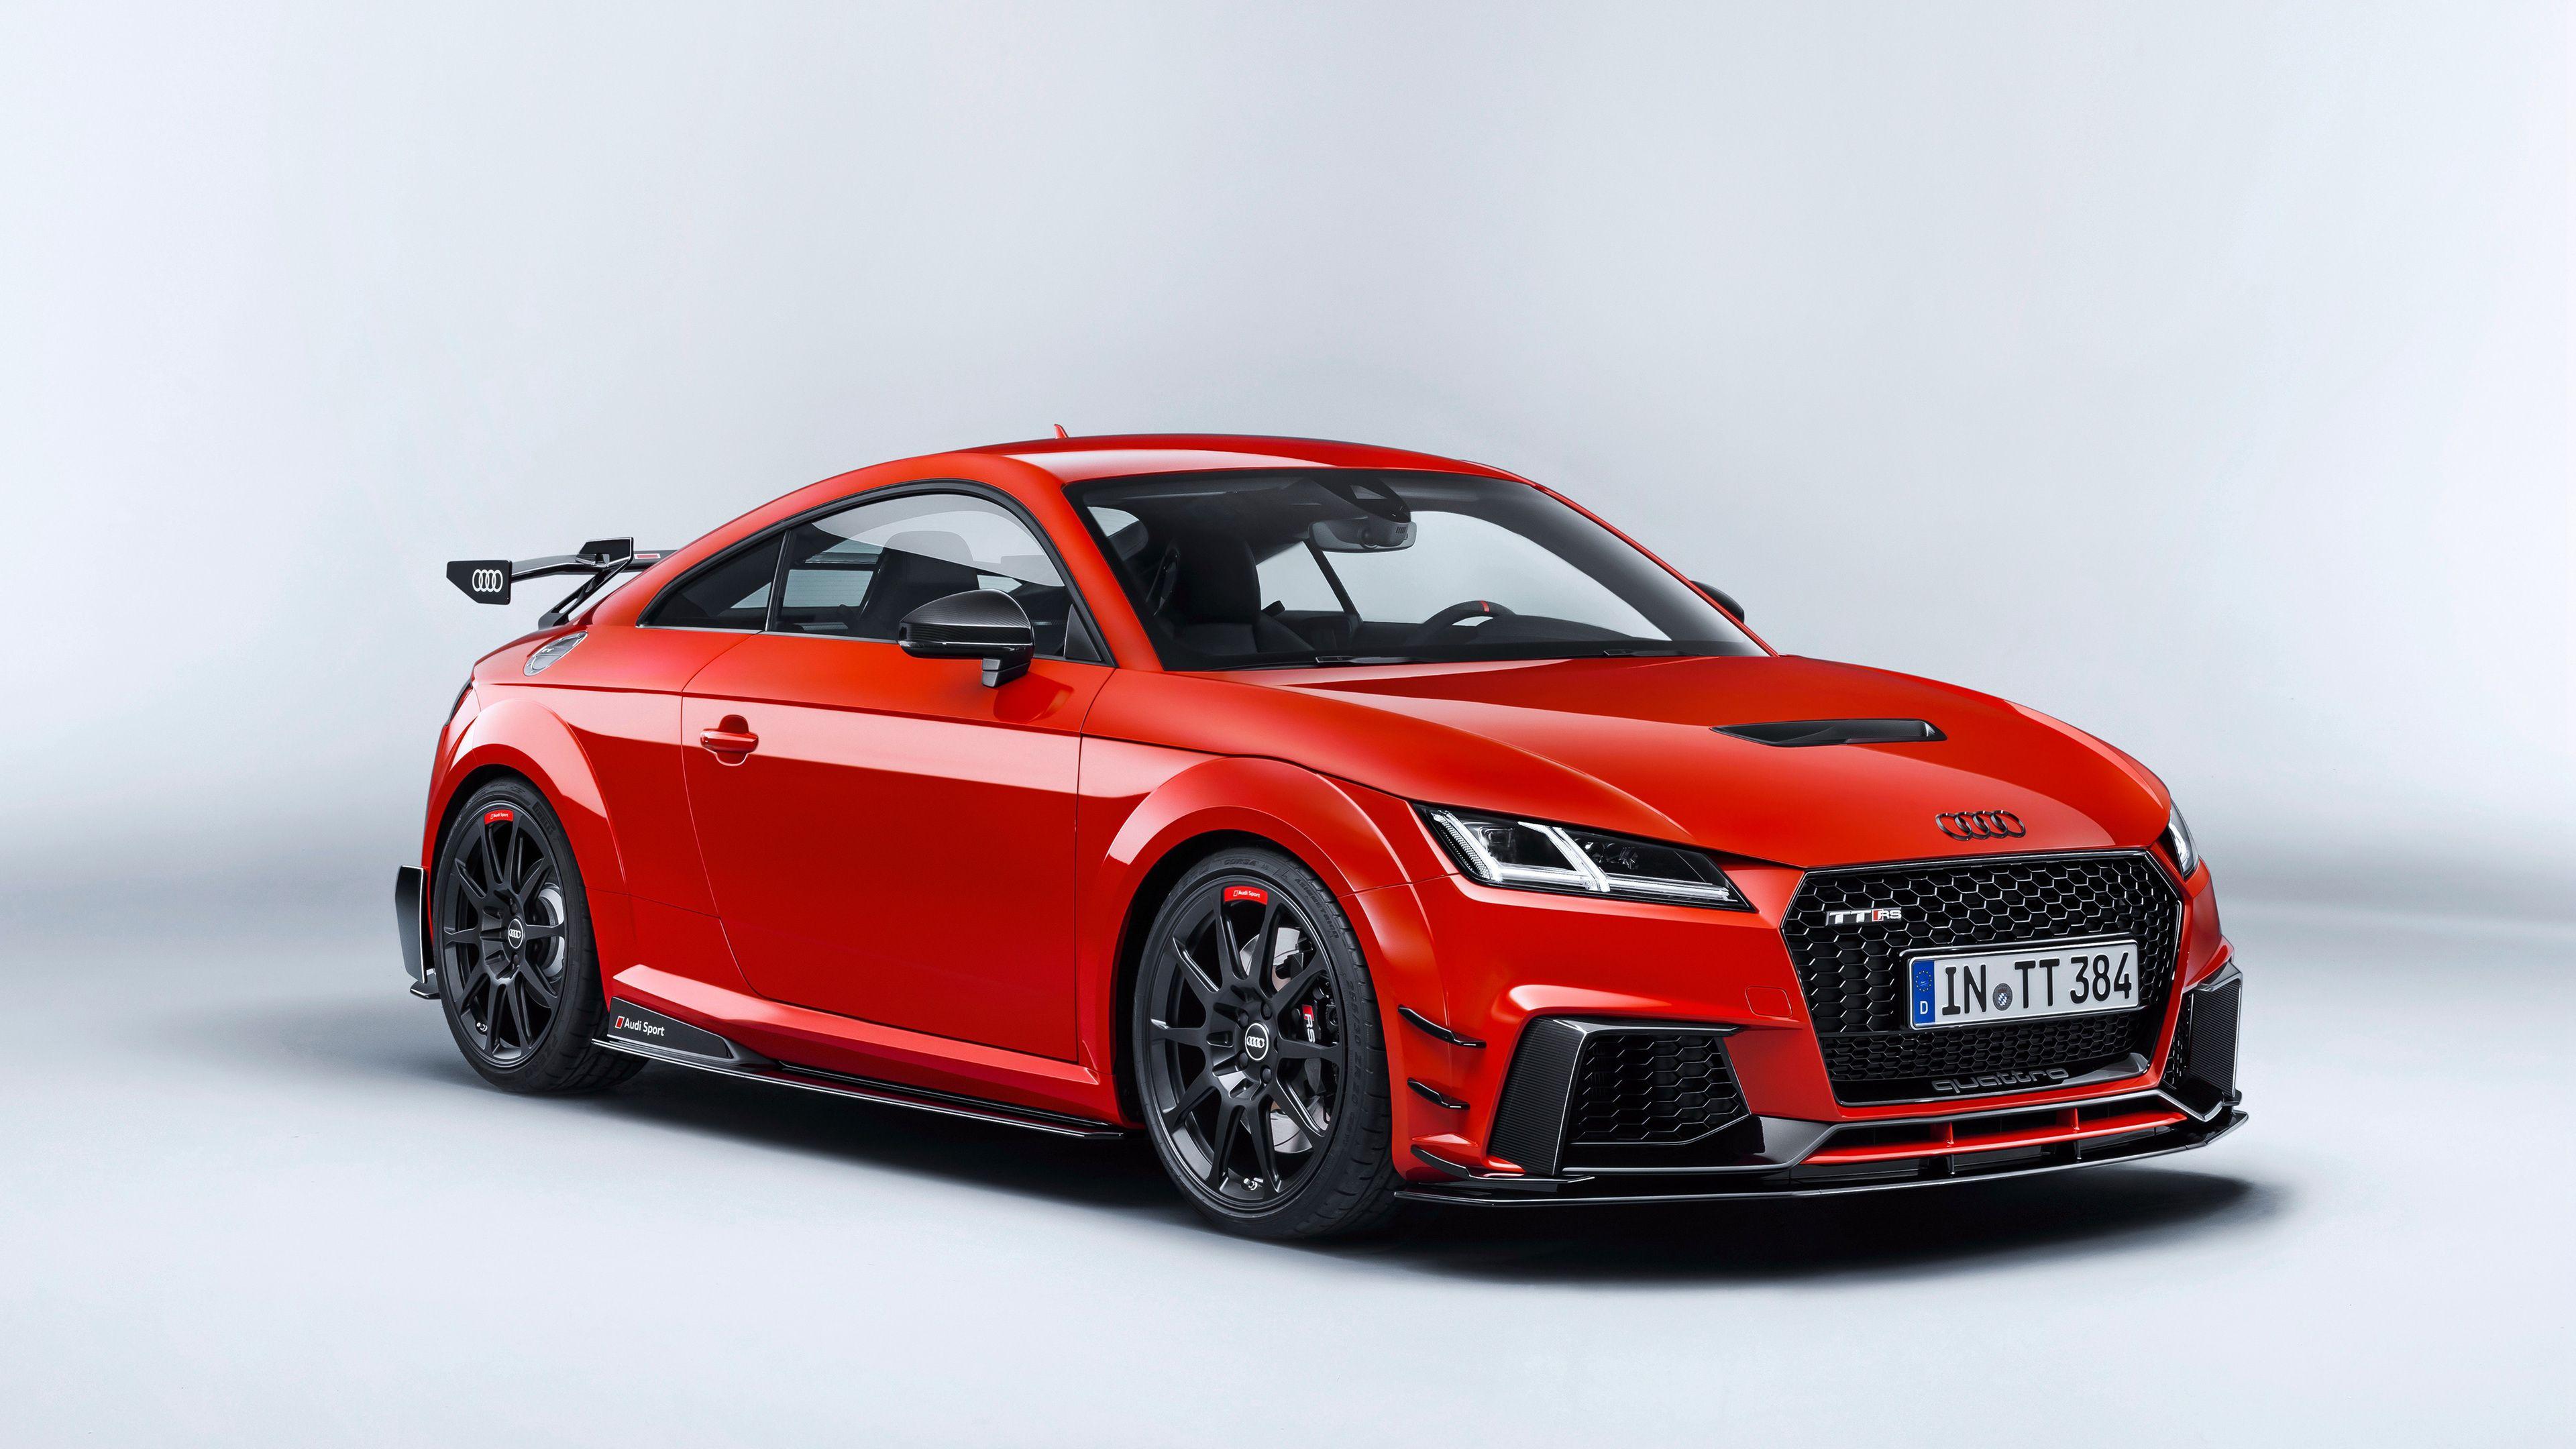 Wallpaper 4k Audi Tt Rs Performance Parts 2017 Cars Wallpapers 4k